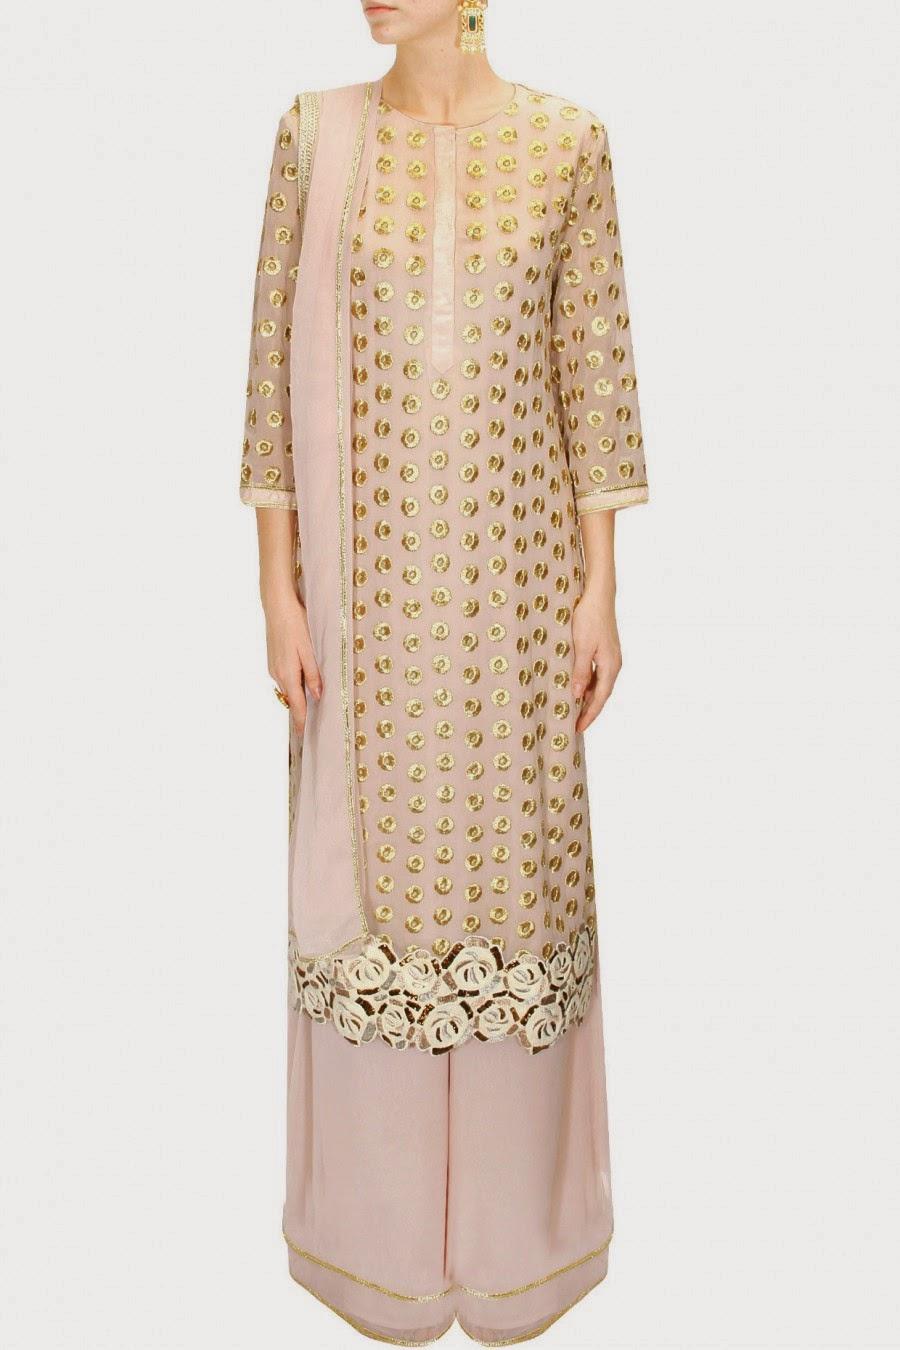 Aza fashions pvt ltd 29